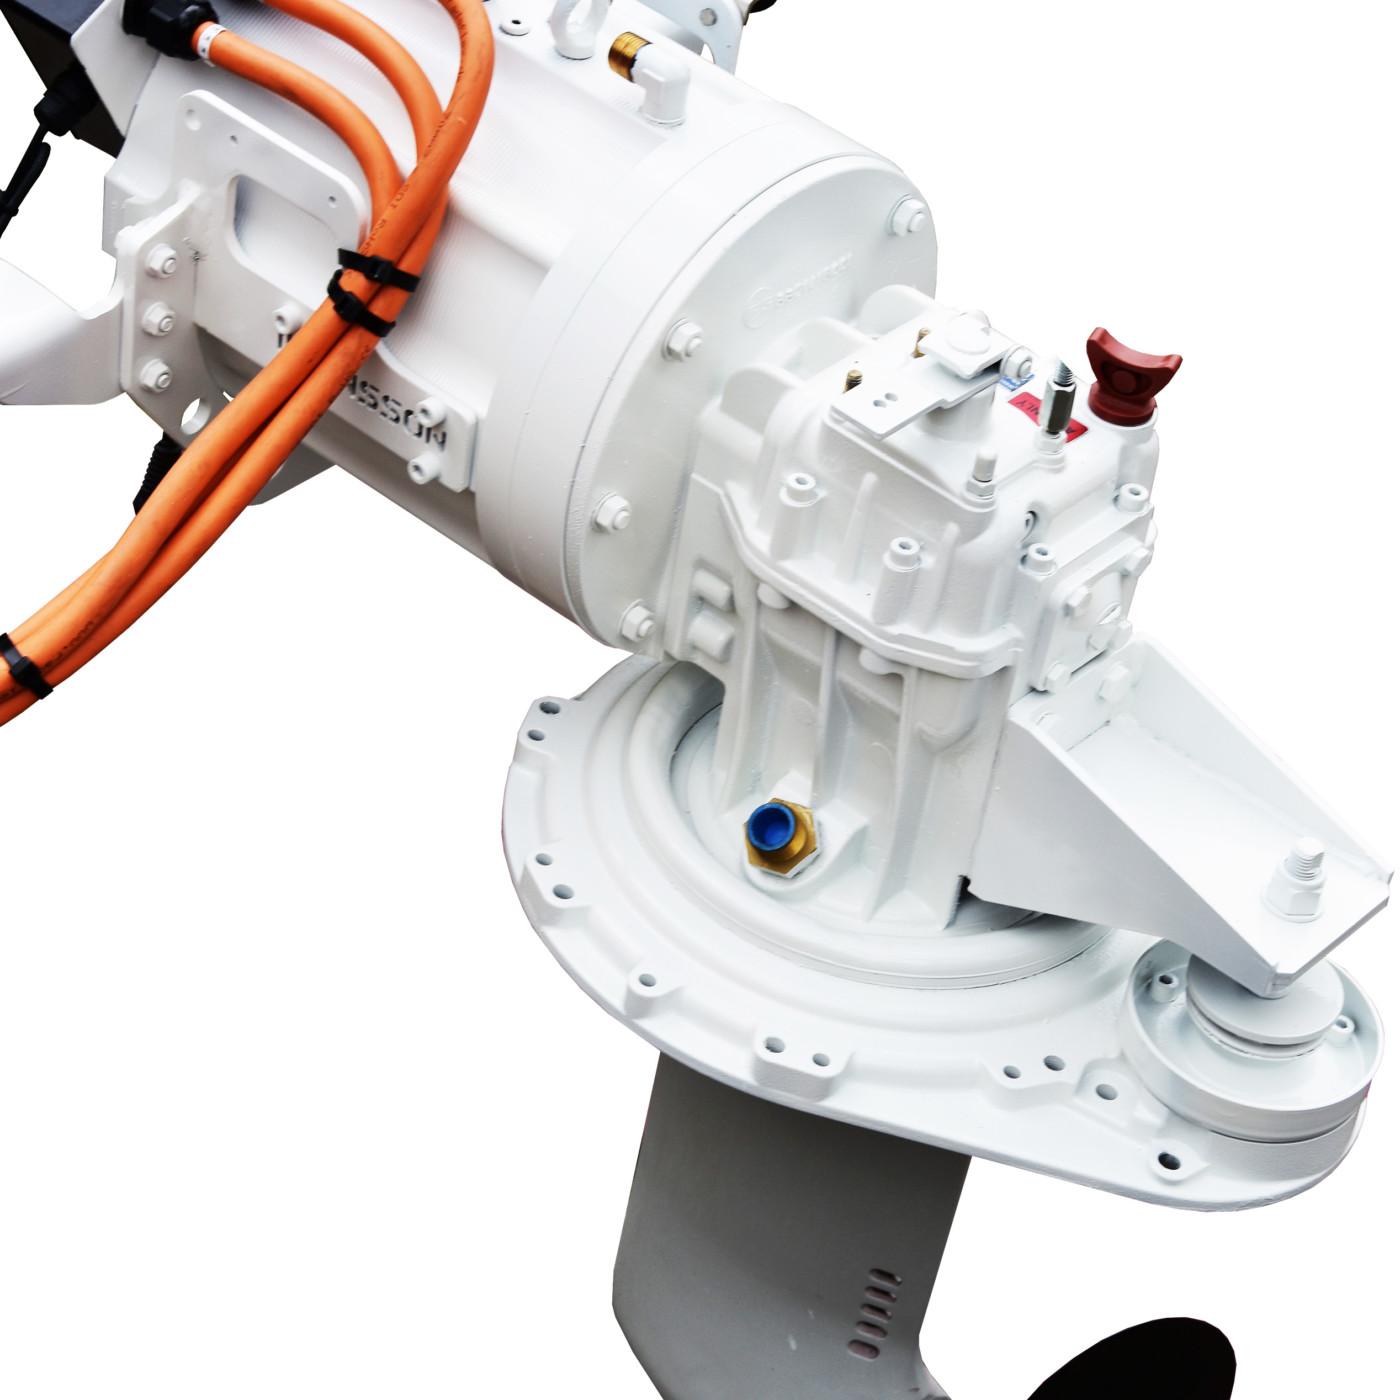 Website afbeelding, Imansson Elektromotor Marine, 19 kW 48 Volt, bovenaanzicht (saildrive) sq